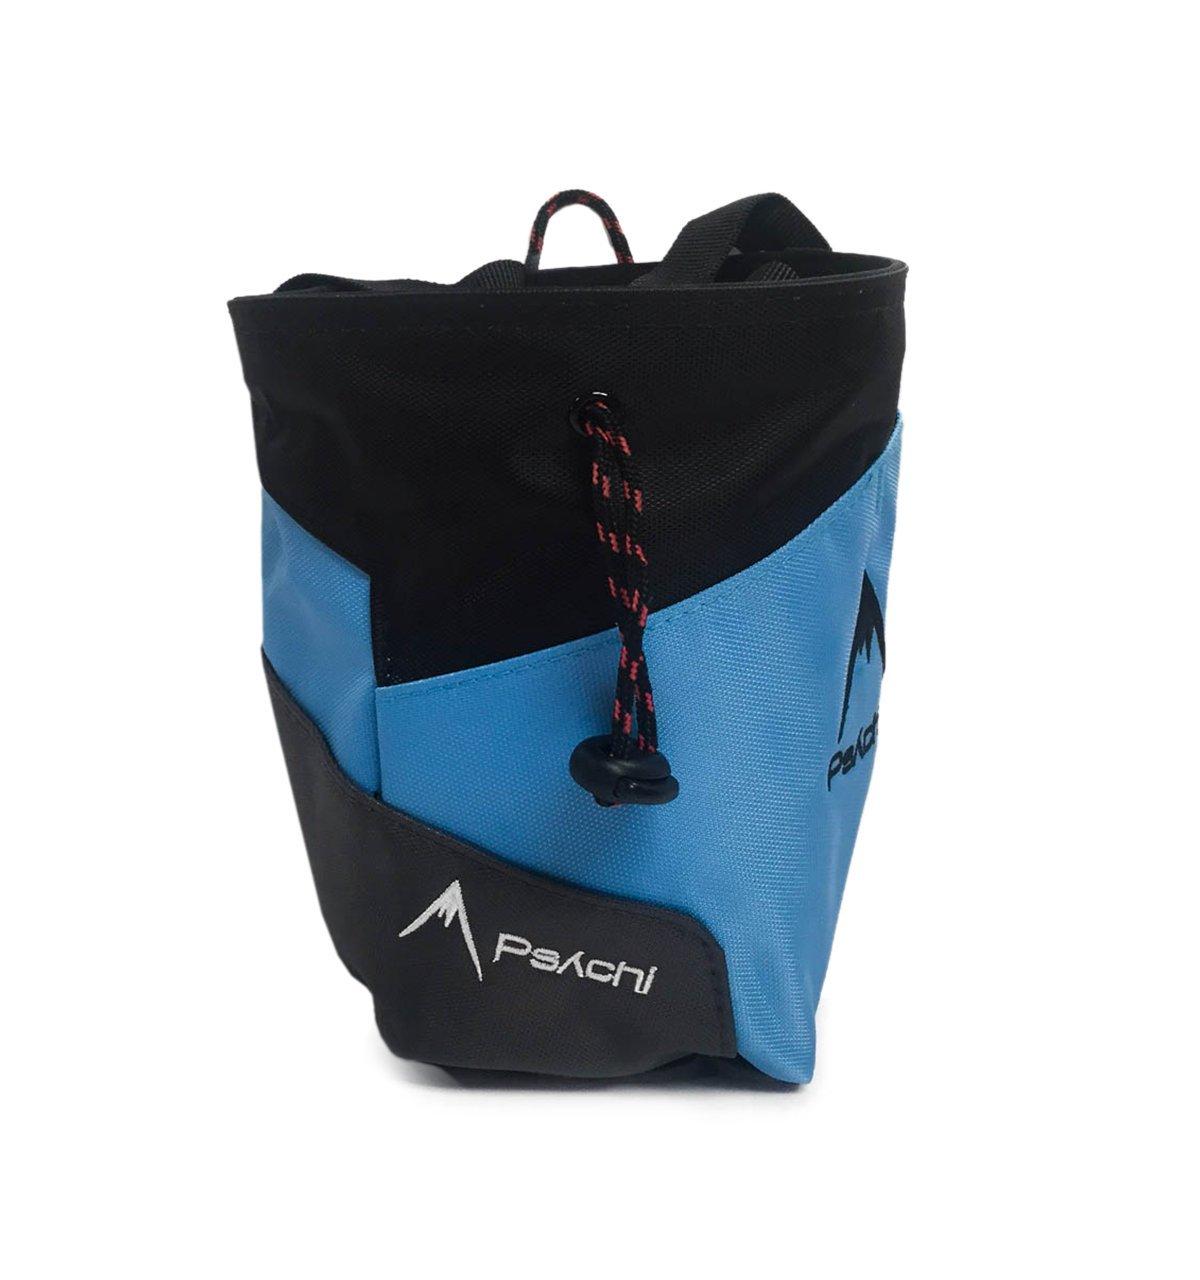 PsychiBolsa de accesorios para escalada en roca o en bloque para principiantes, alta calidad, con bola de tiza y cepillo, con cinturón